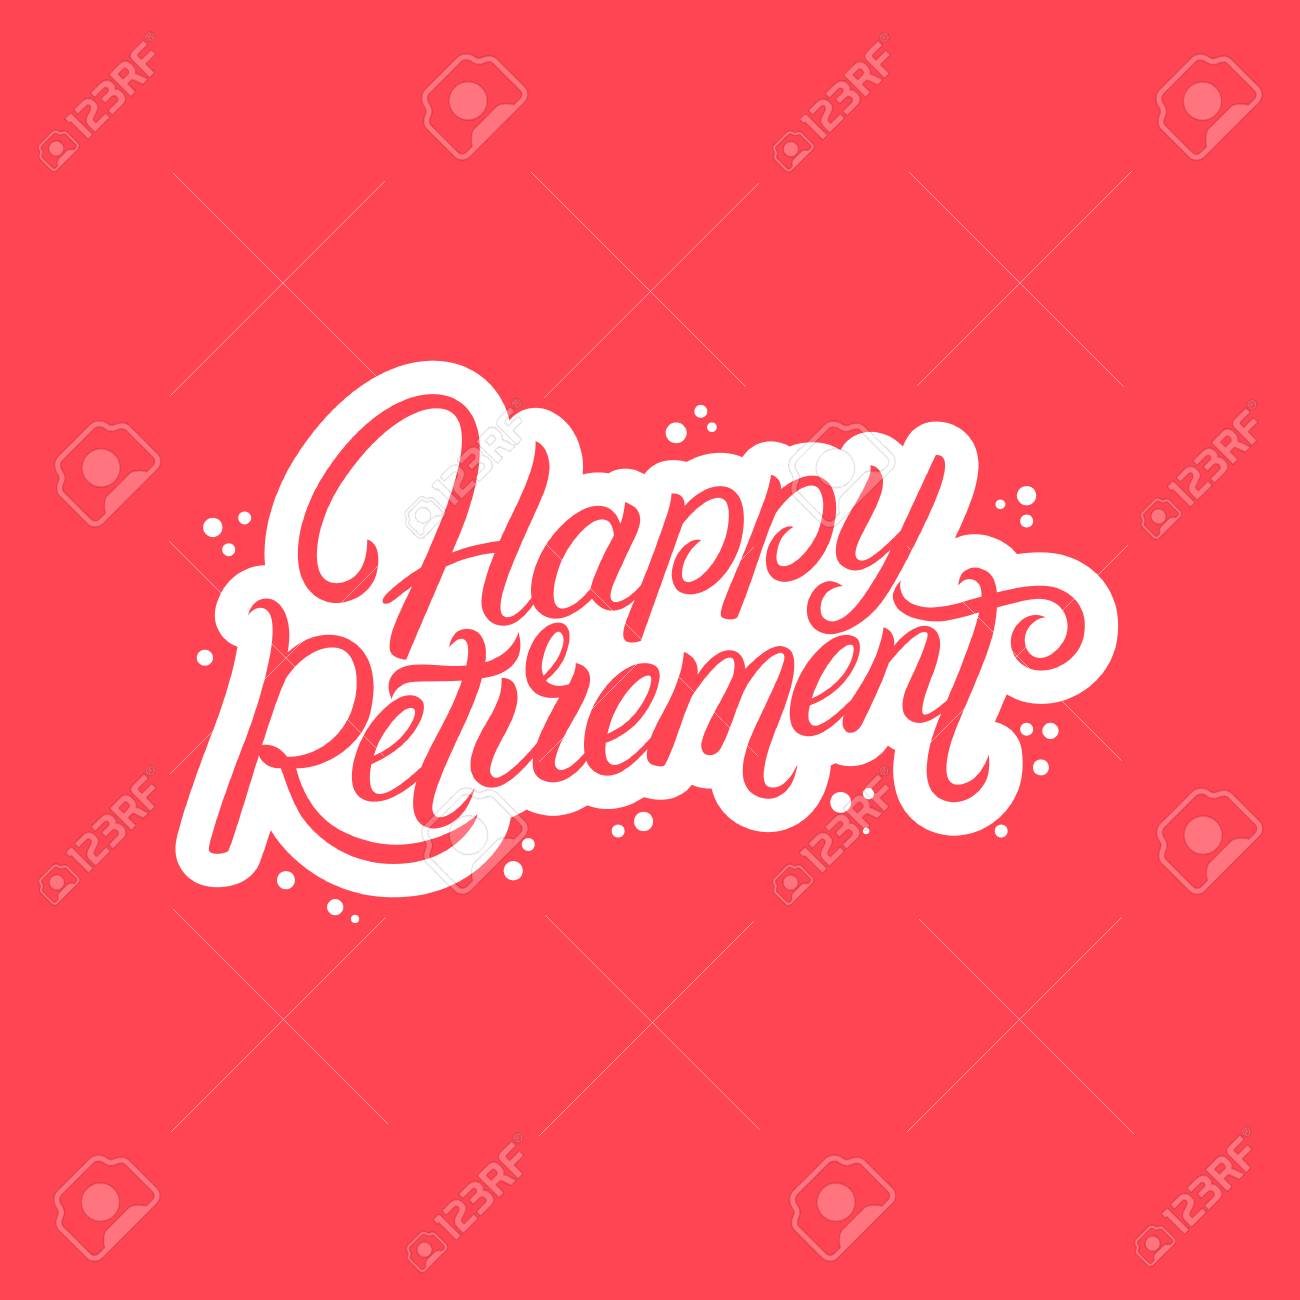 Happy Retirement hand written lettering. Modern brush calligraphy. Template for greeting card, poster, logo, badge, icon, banner. Vector illustration. - 123625743